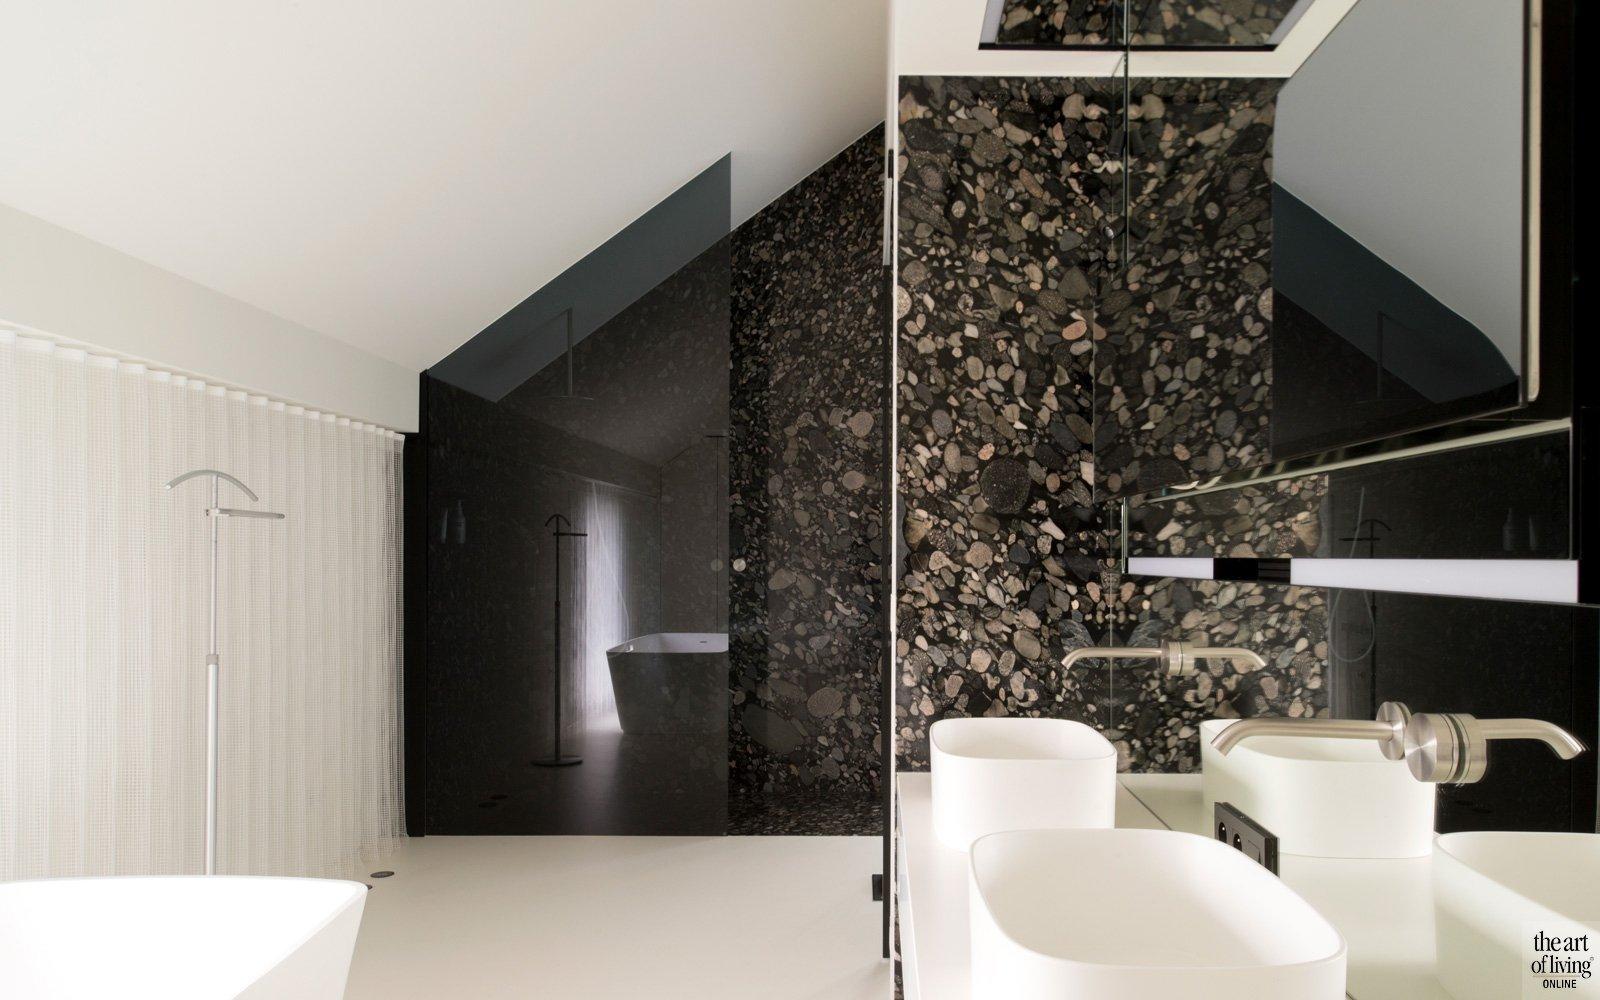 Wandbekleding, Muur, Inspiratie, Design, Villa